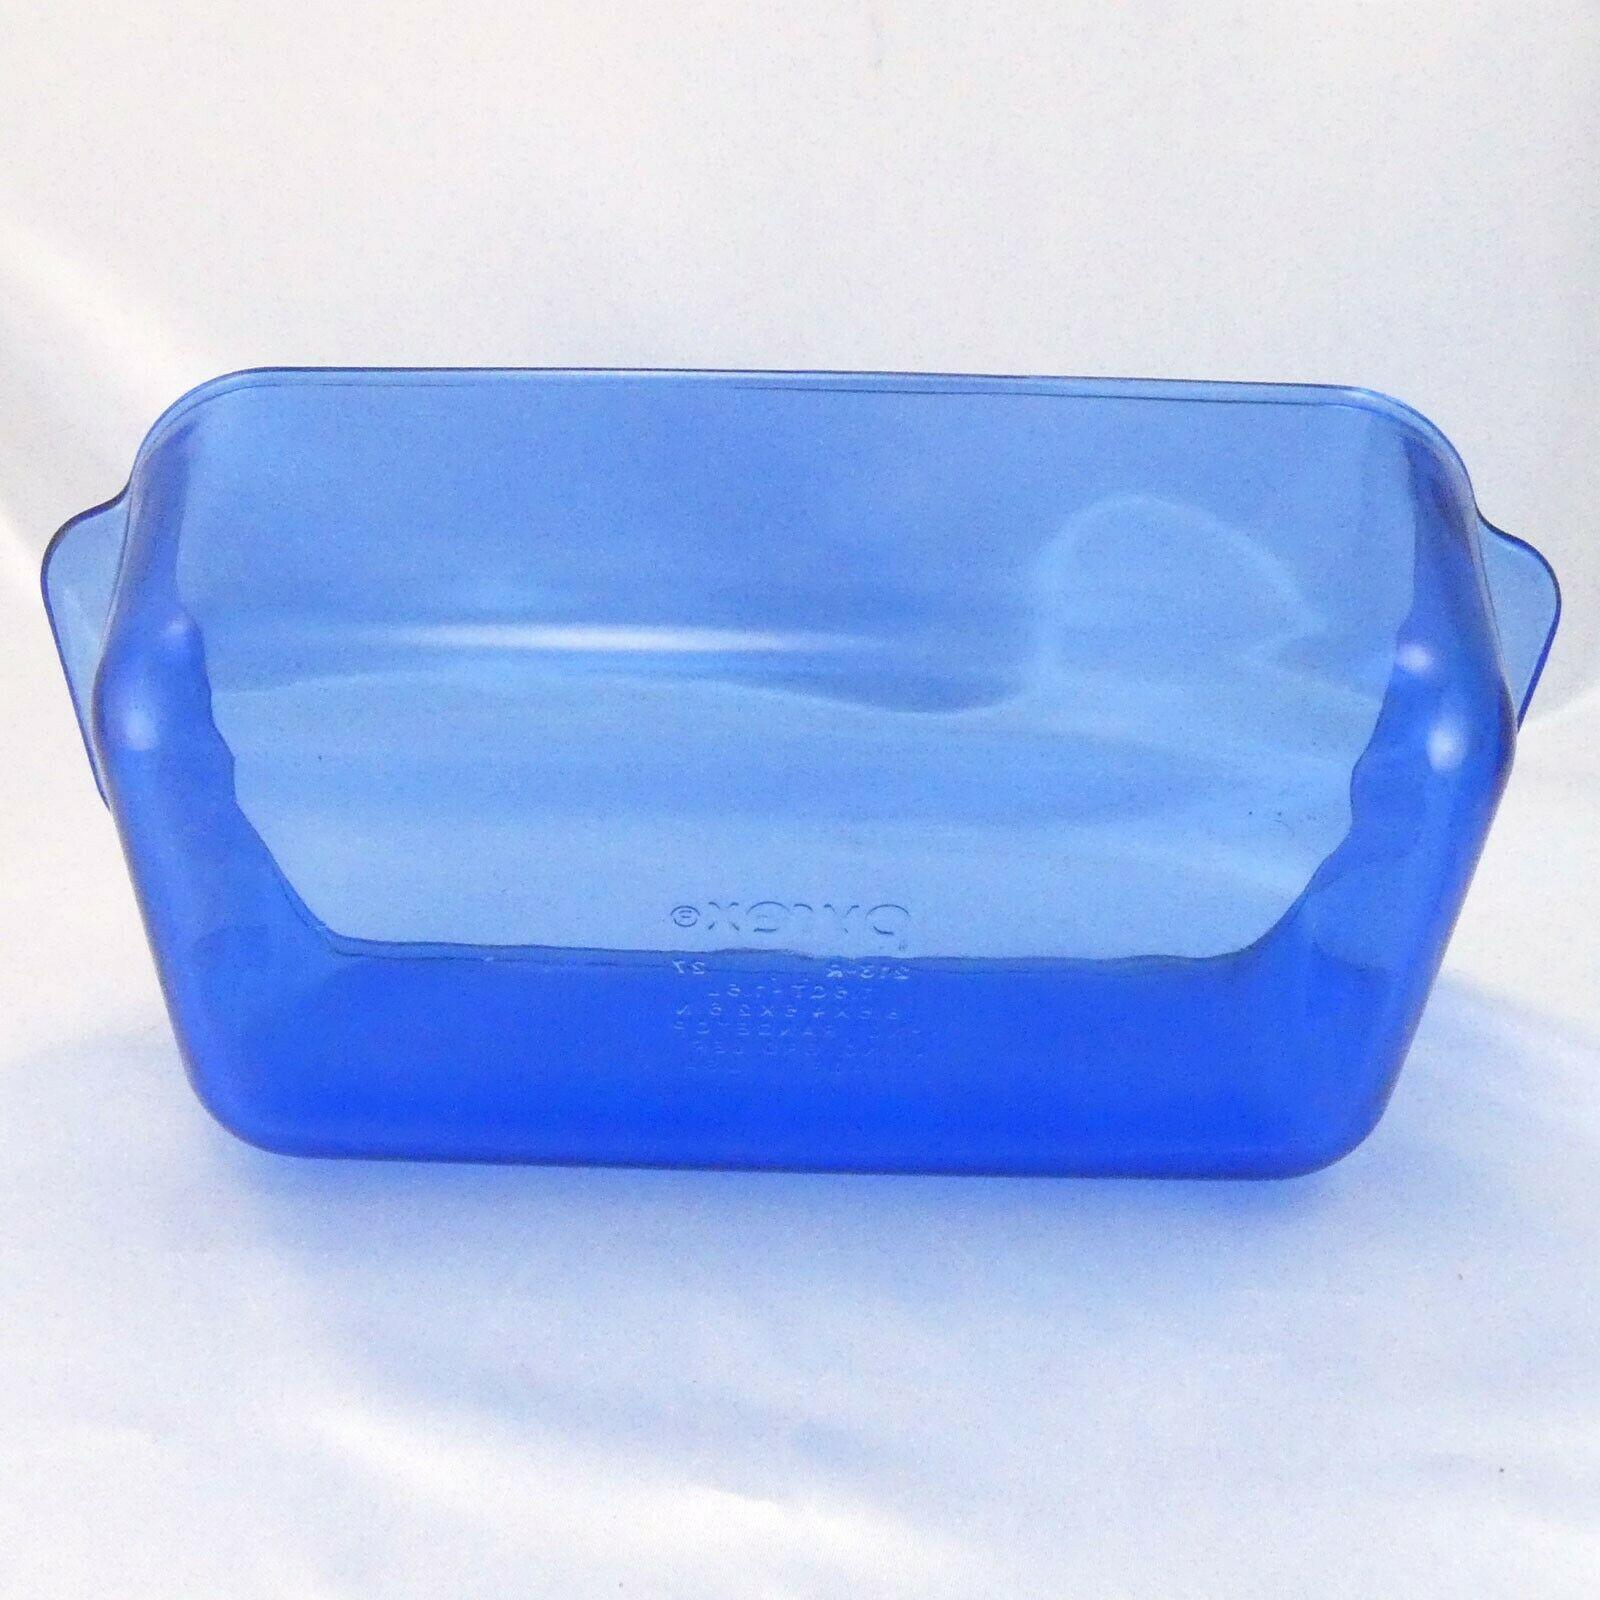 "Pyrex 213-R Cobalt Blue Loaf Pan 1.5qt Baking Dish 8.5""x4.5""x2.5"" image 5"